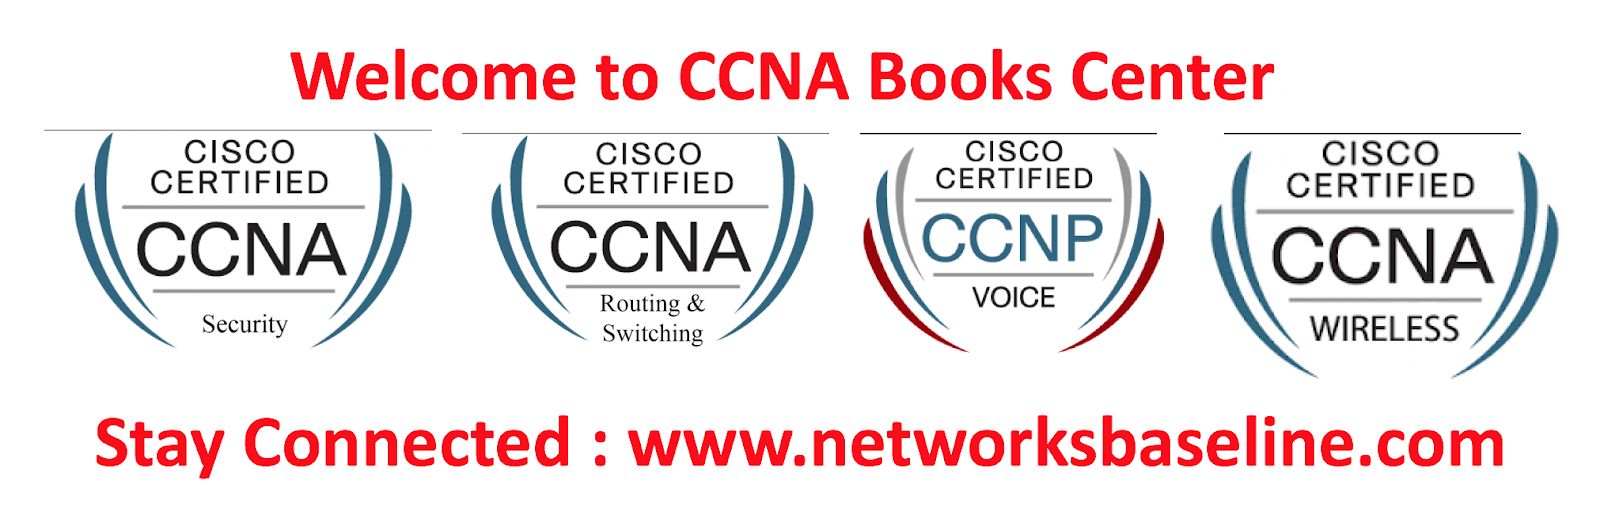 7th edition ccna 640-802 pdf